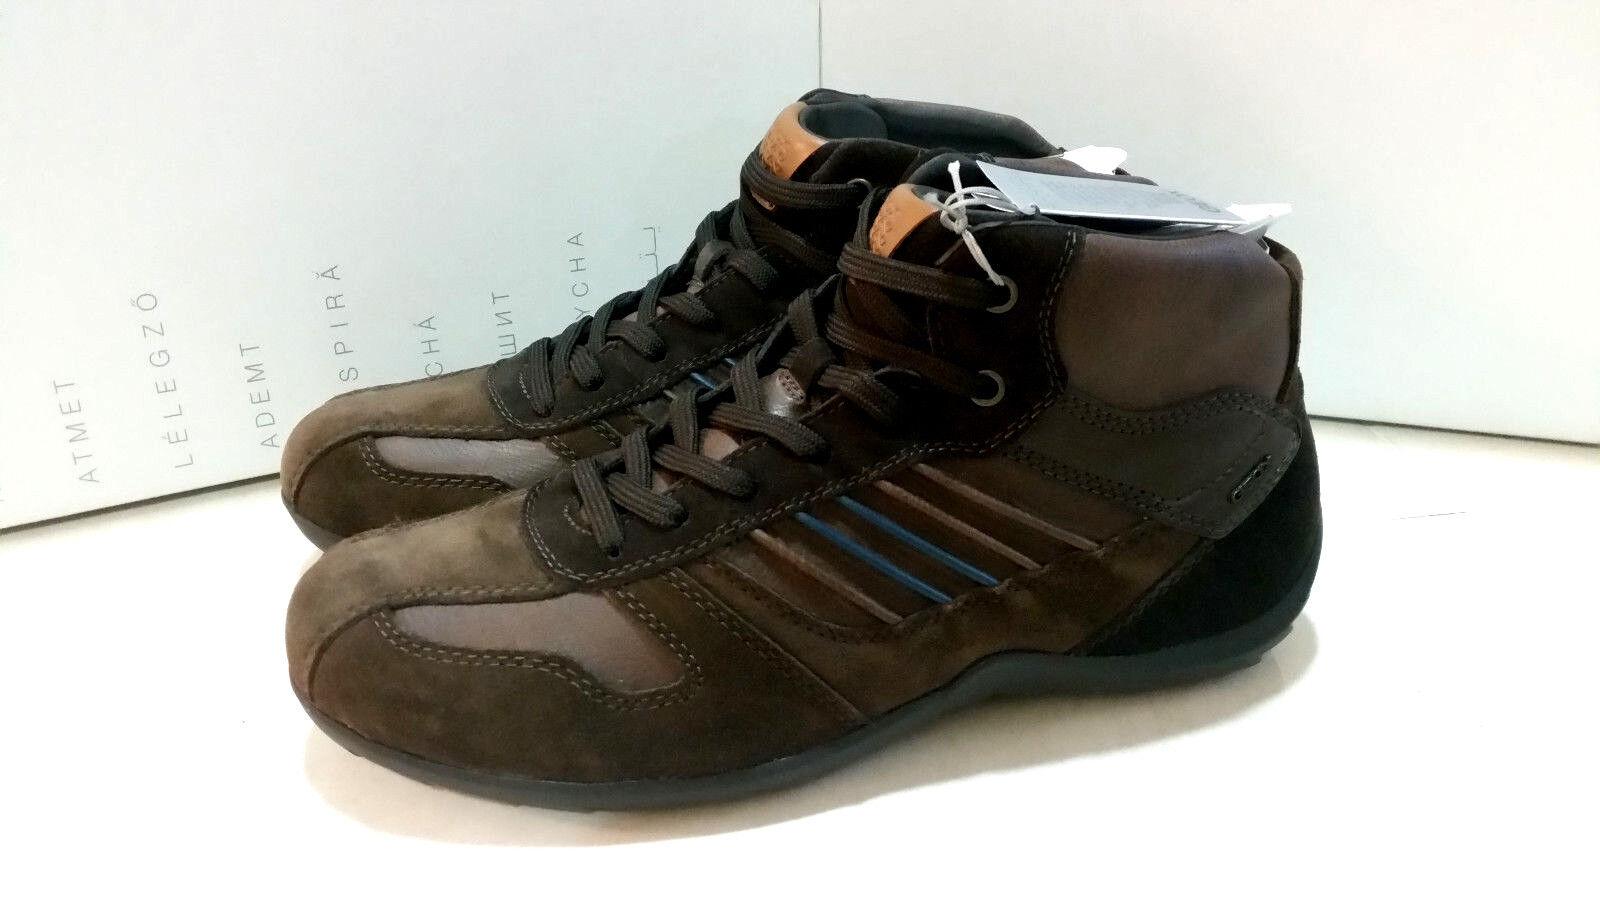 Geox respira u Pavel B Gamuza + Tumb. GBK botas para hombre de EE. UU. marrón castaño